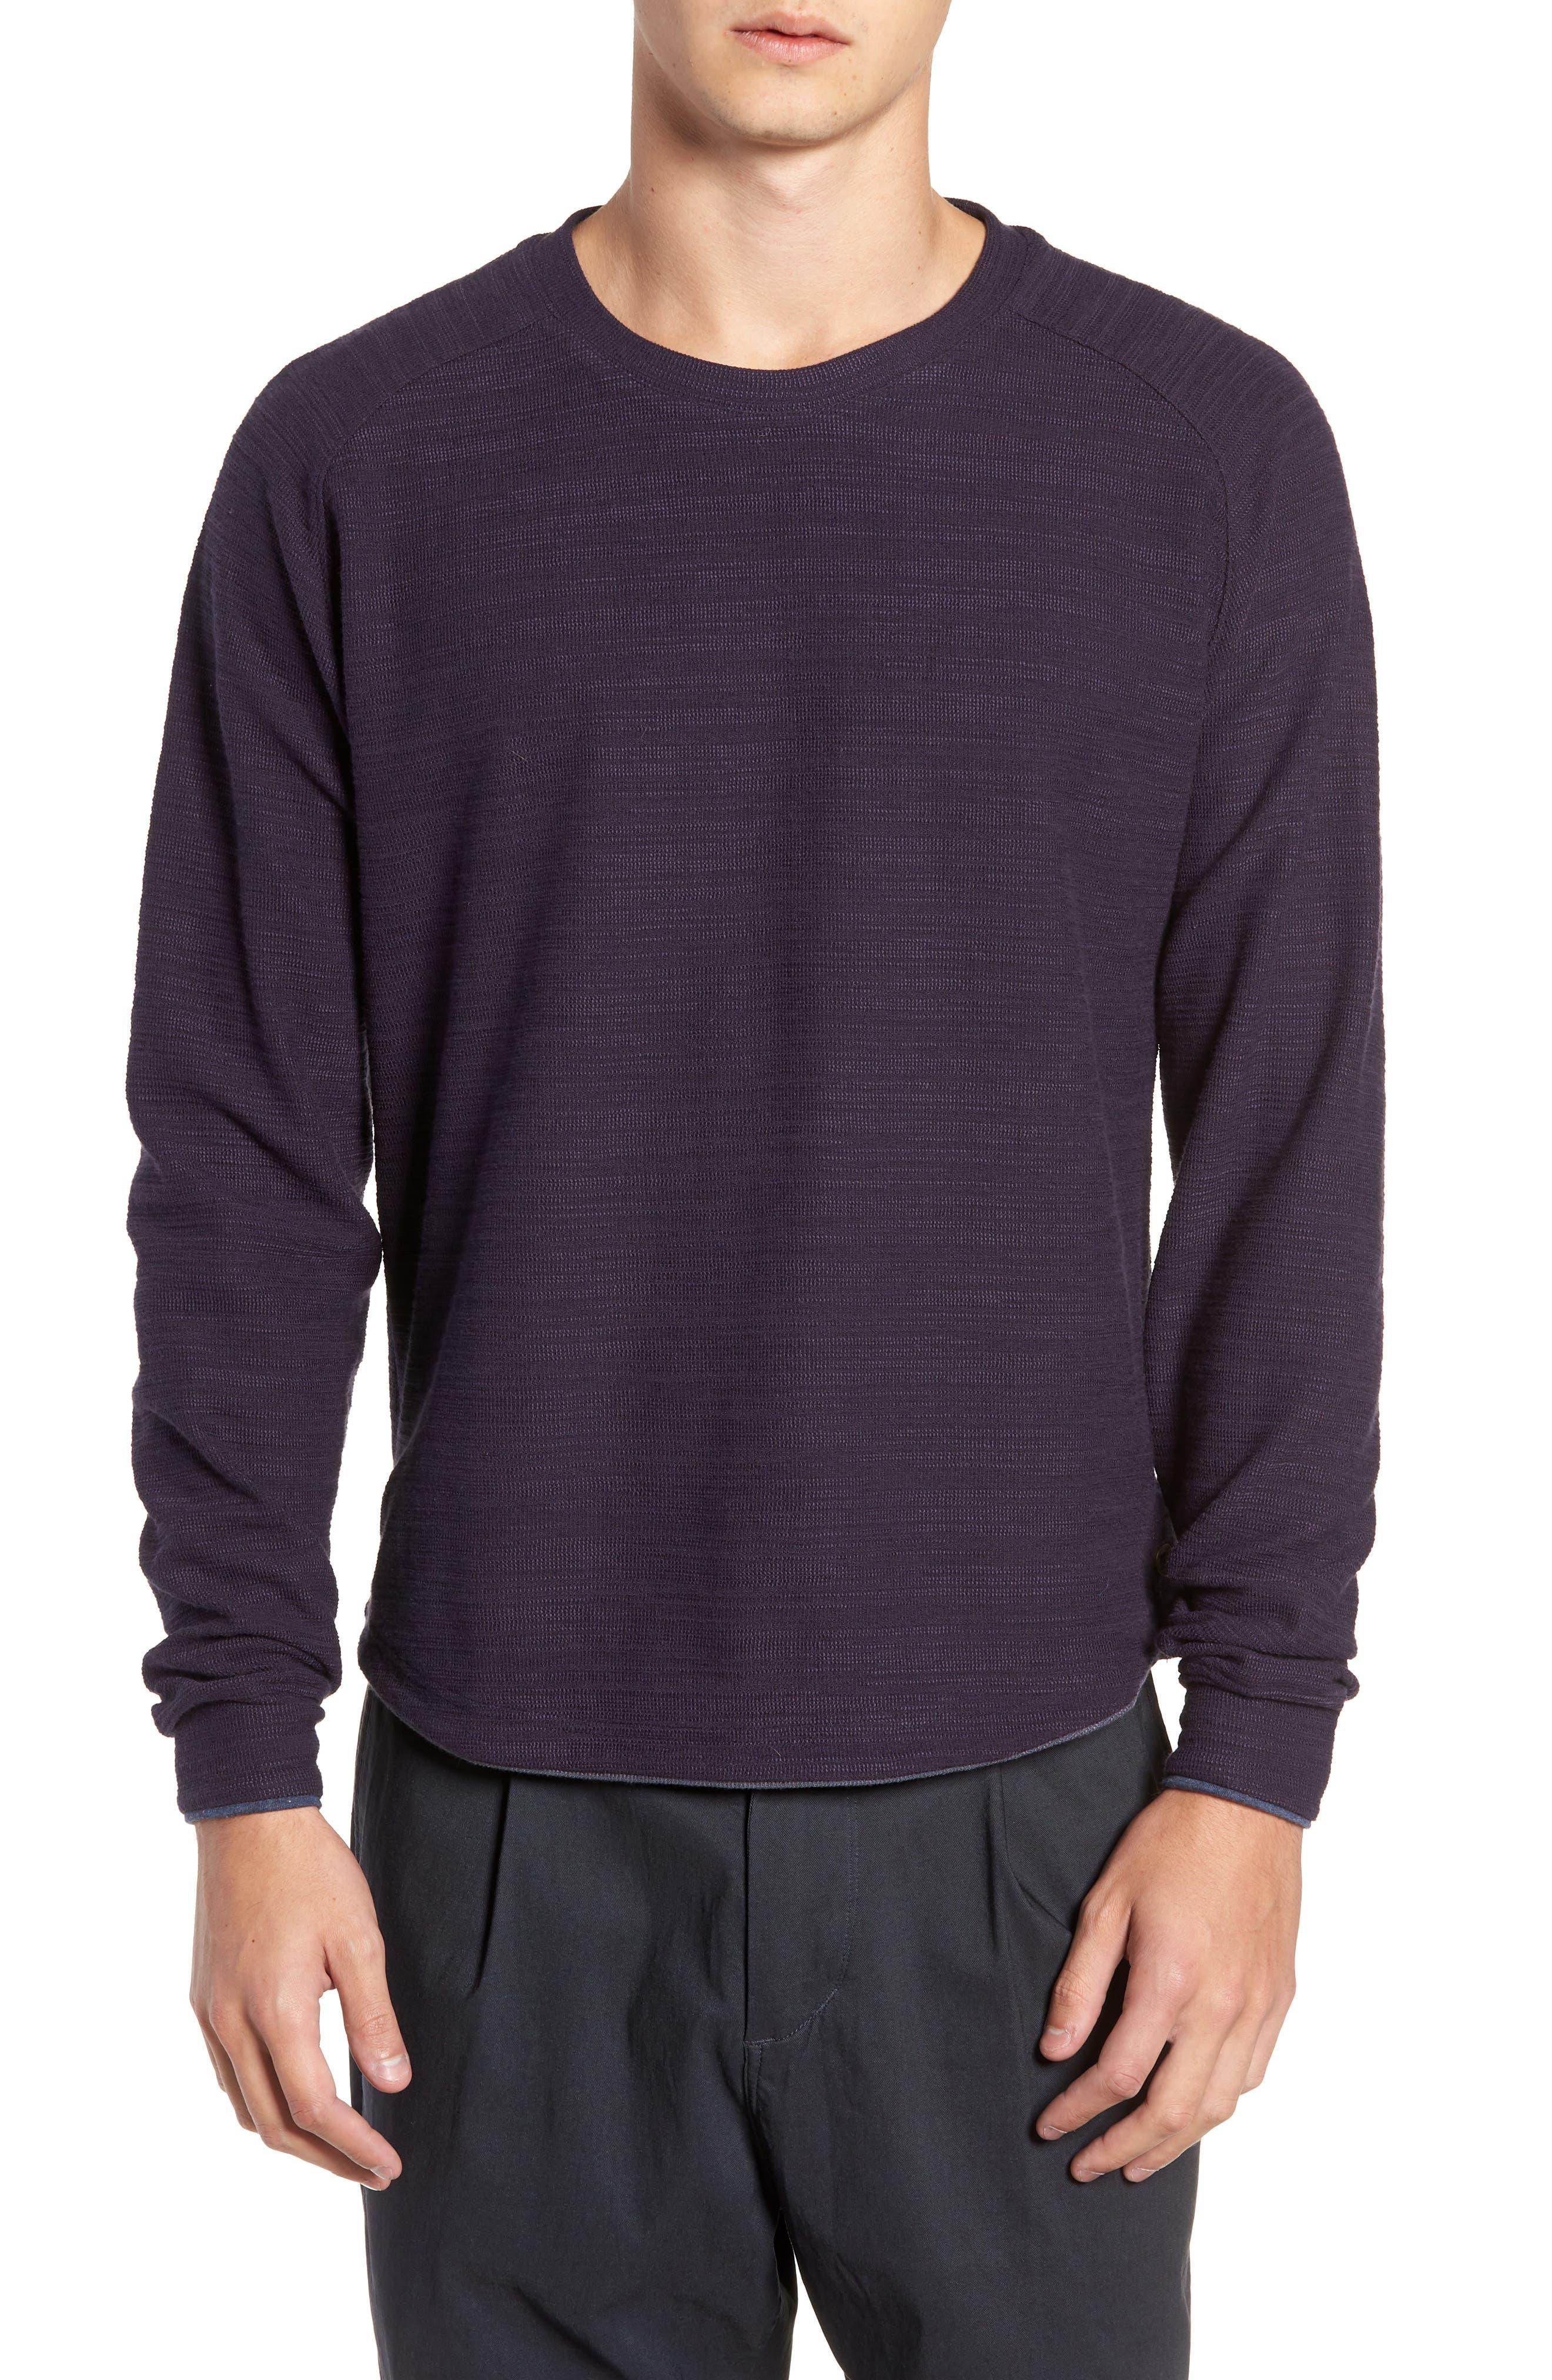 250 Loft Slubbed Crewneck Sweater,                         Main,                         color, NAVY